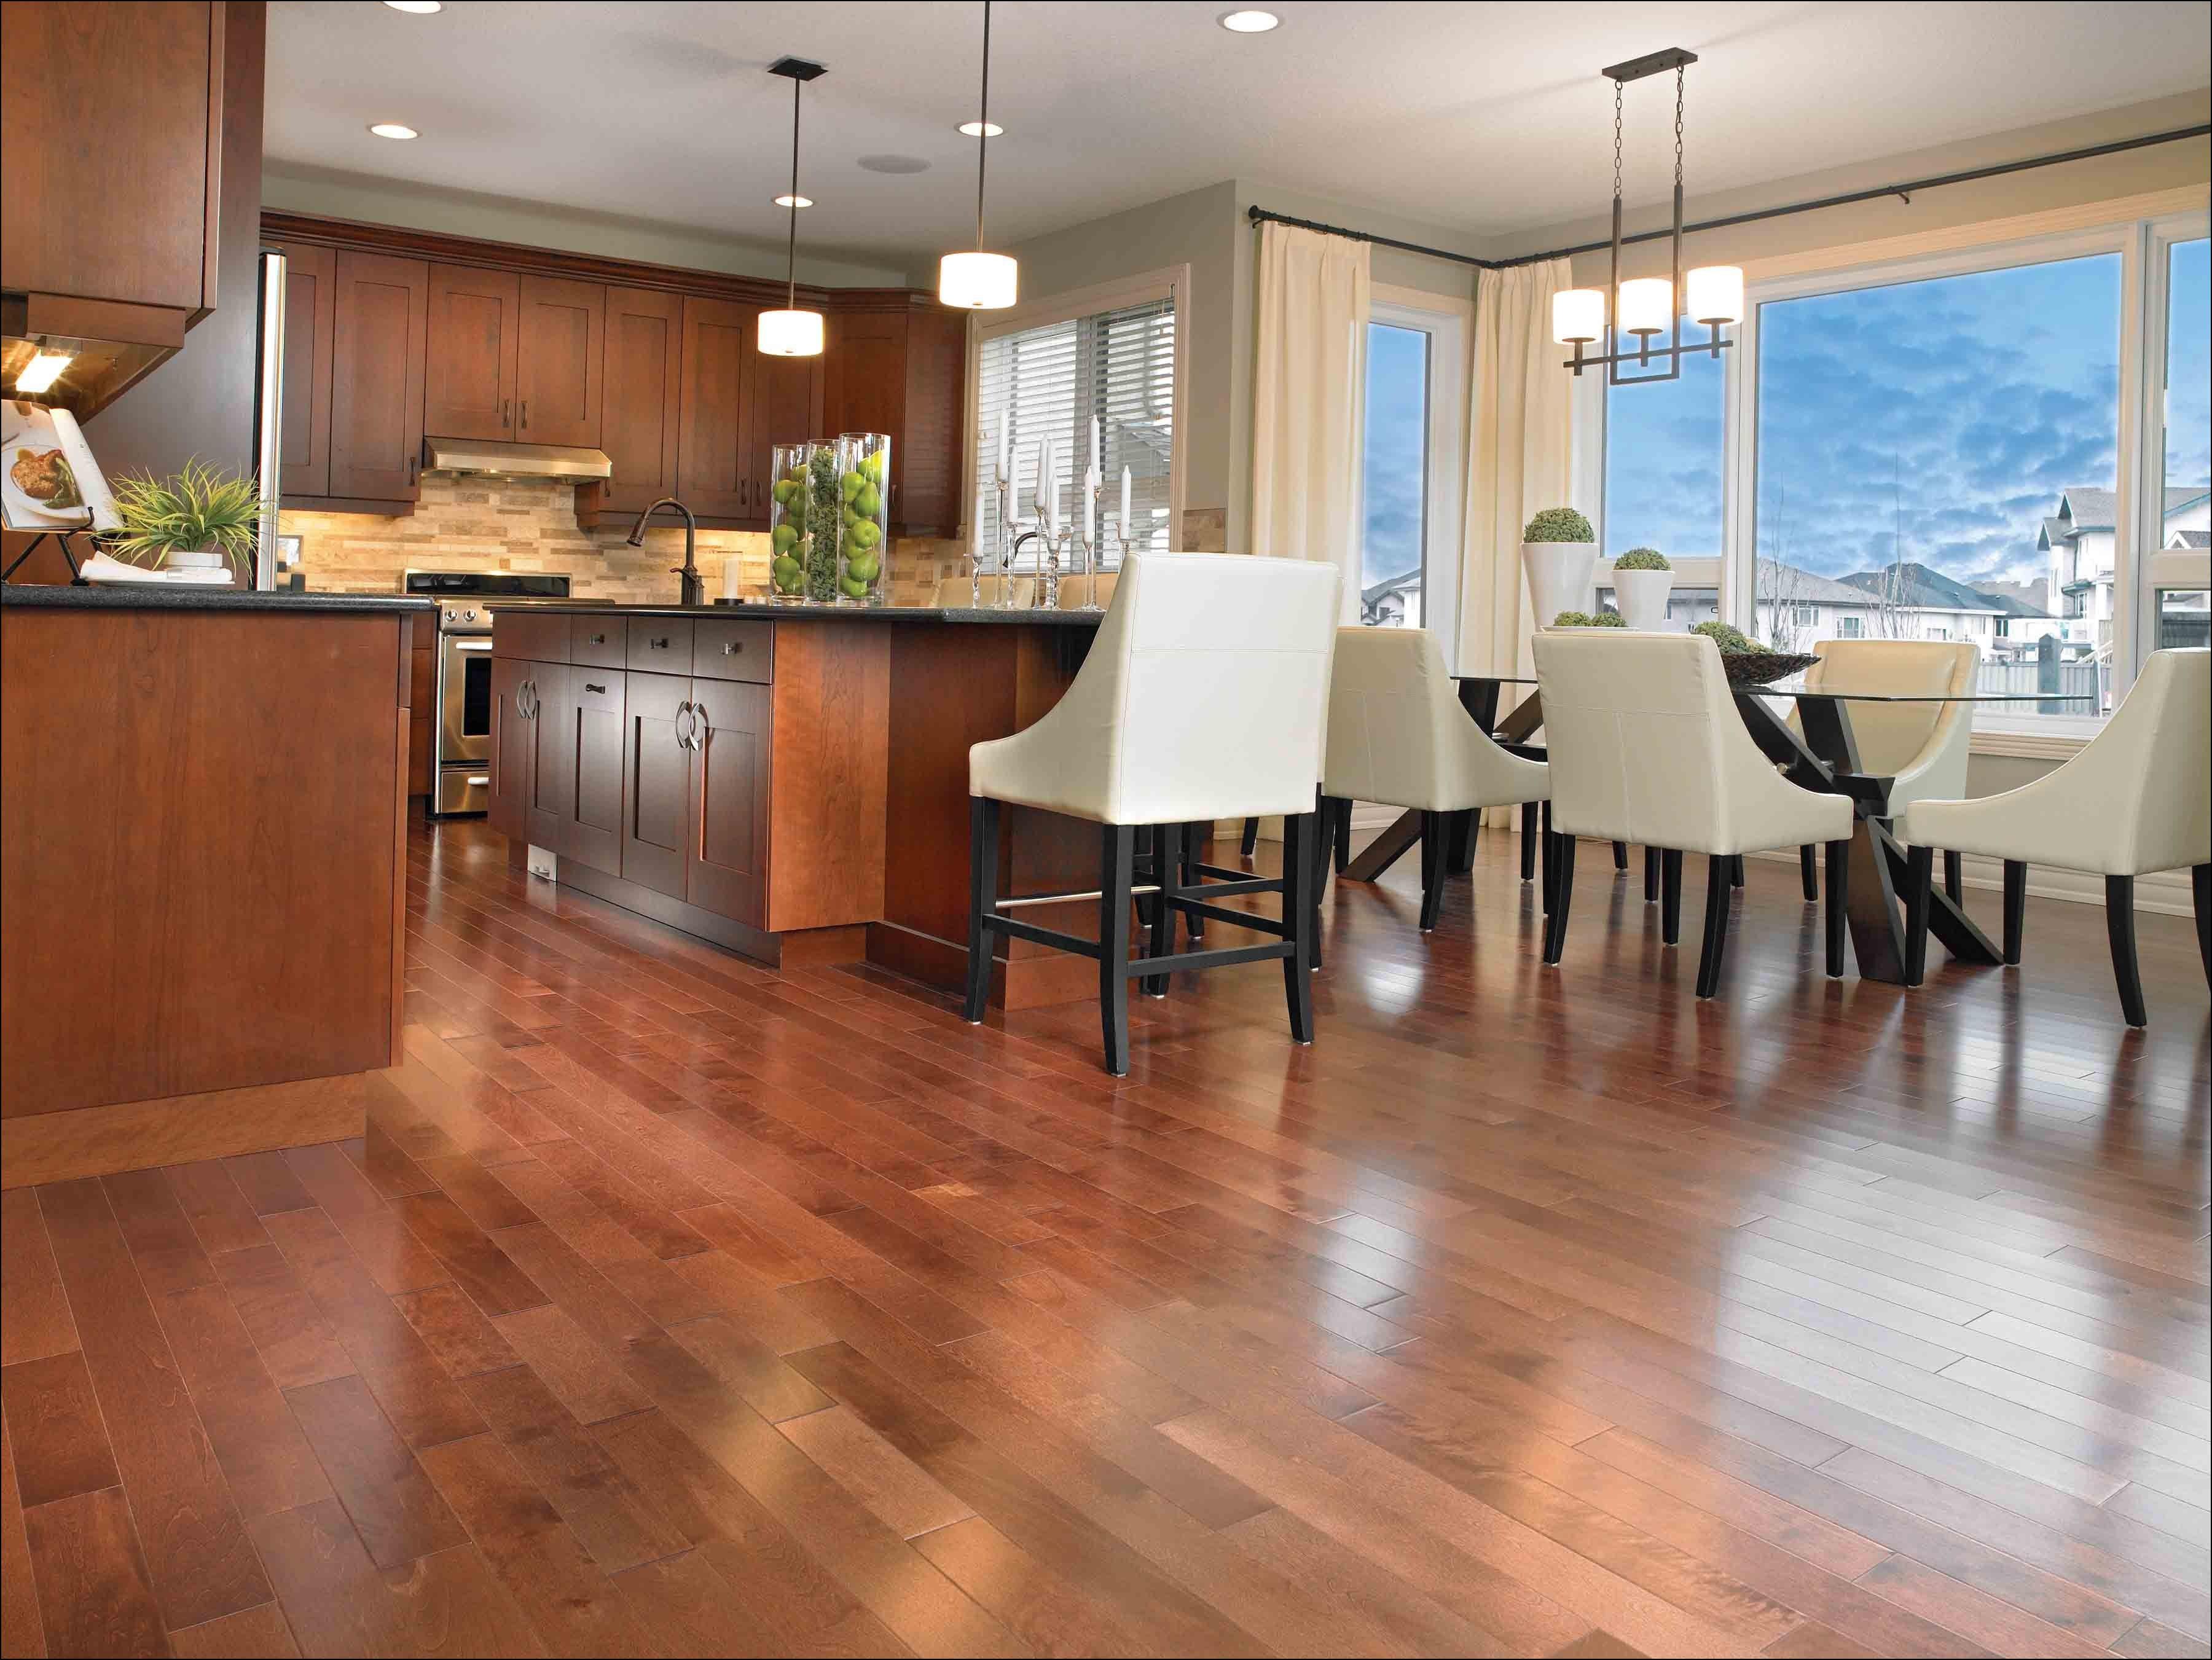 Hardwood Floor Refinishing toronto On Of Hardwood Flooring Suppliers France Flooring Ideas Regarding Hardwood Flooring Installation San Diego Images 54 Best Exotic Flooring Images On Pinterest Of Hardwood Flooring